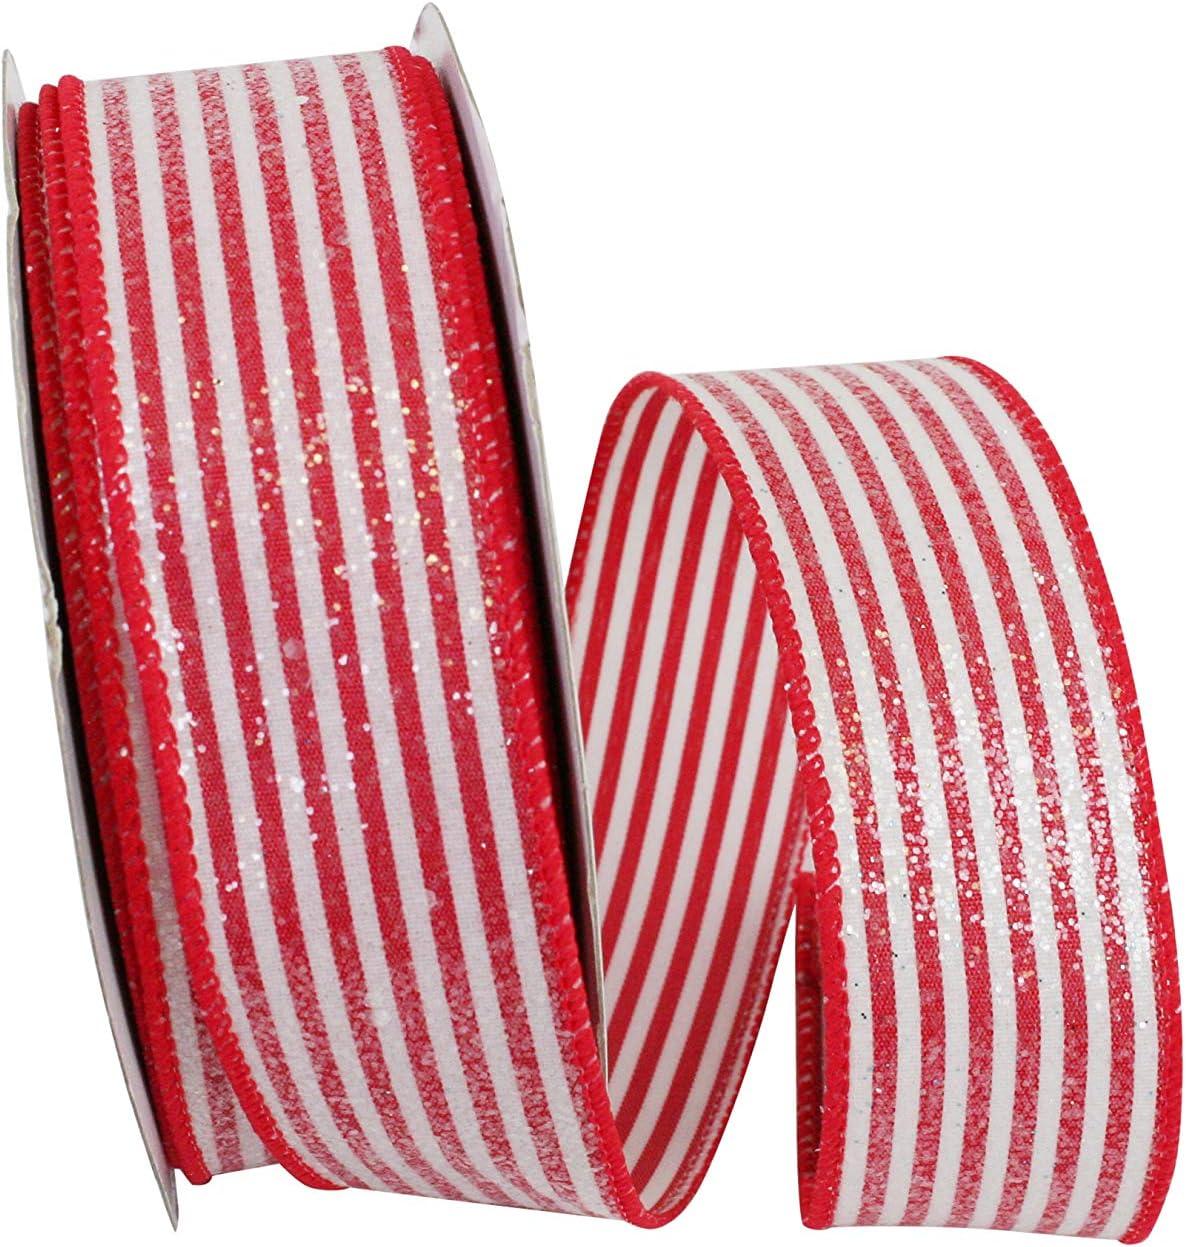 Reliant Ribbon Satin Glitter Hearts 2 Wired Edge Ribbon White 1-1//2 Inch X 20 Yards